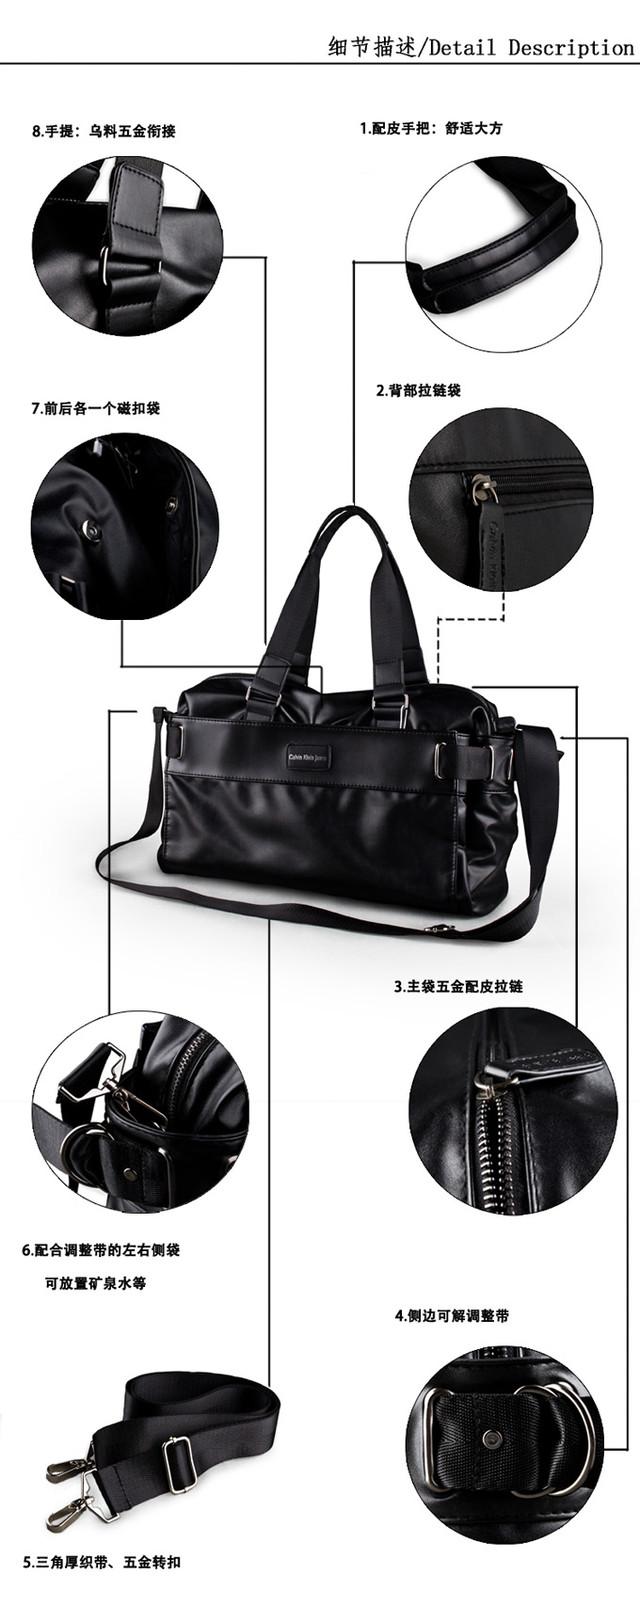 Городская сумка Calvin Klein. Мужская кожаная сумка. Дорожная сумка. Сумки из кожи. Удобная сумка. Код: КСГ1 - фото 7